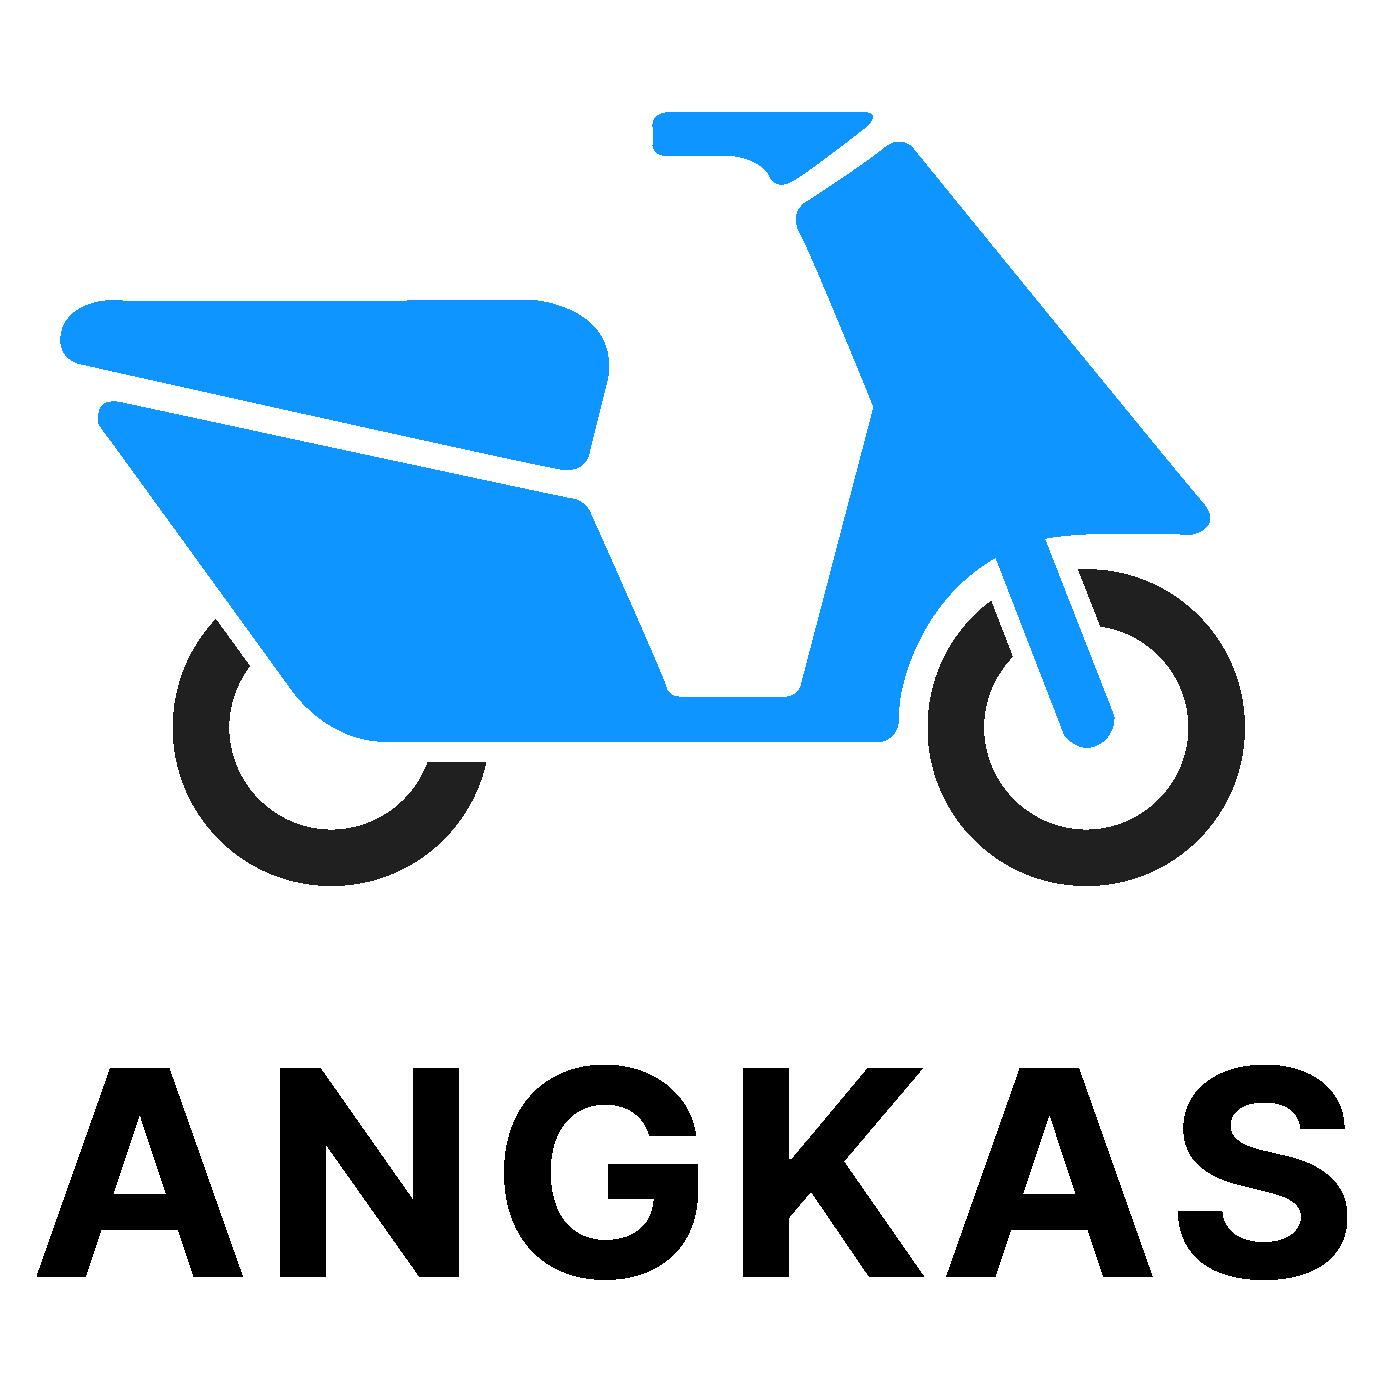 Angkas Logo png